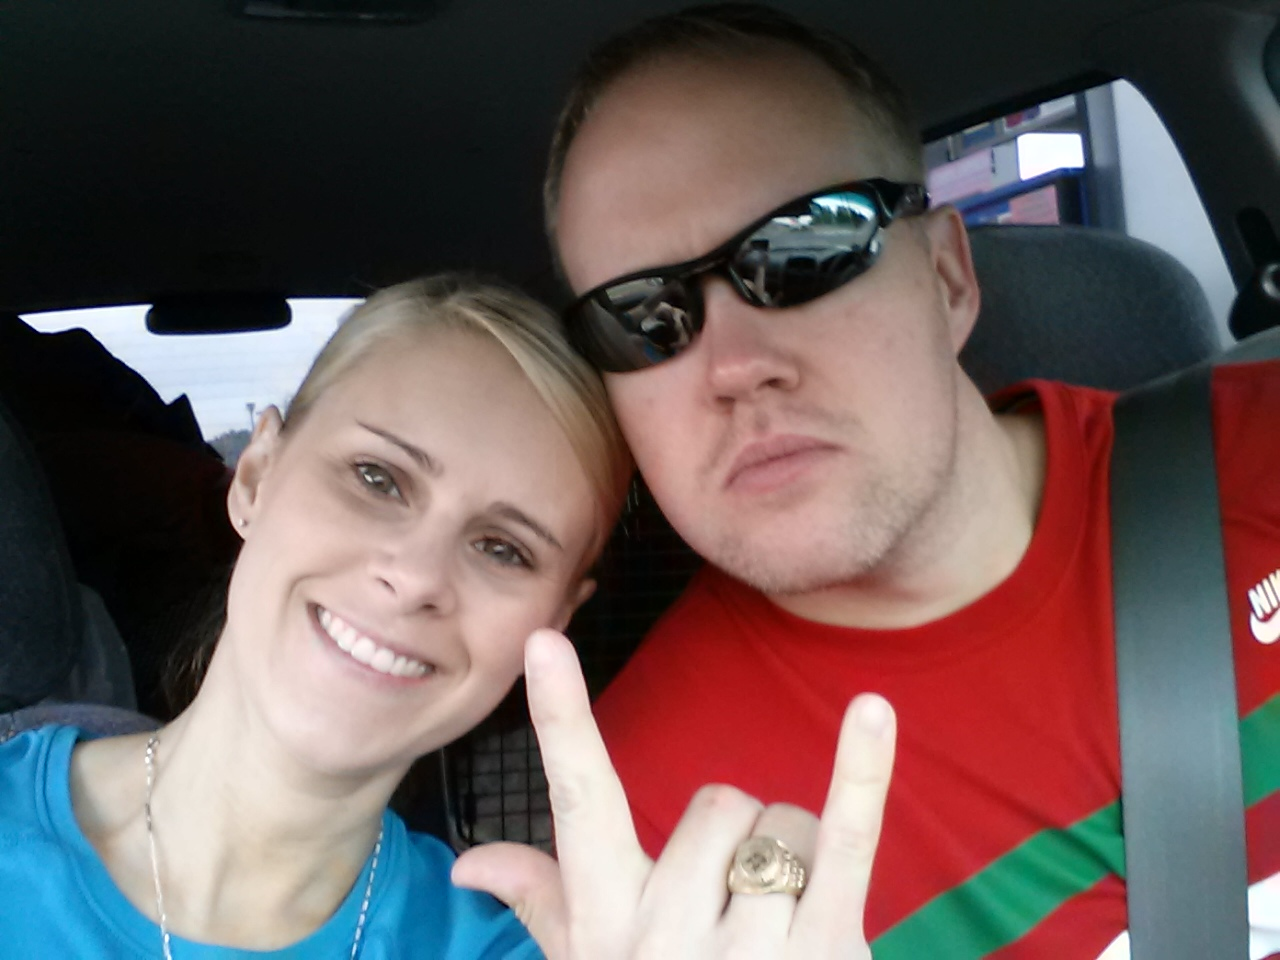 husband Mark Nichols and wife Colerre Lemon